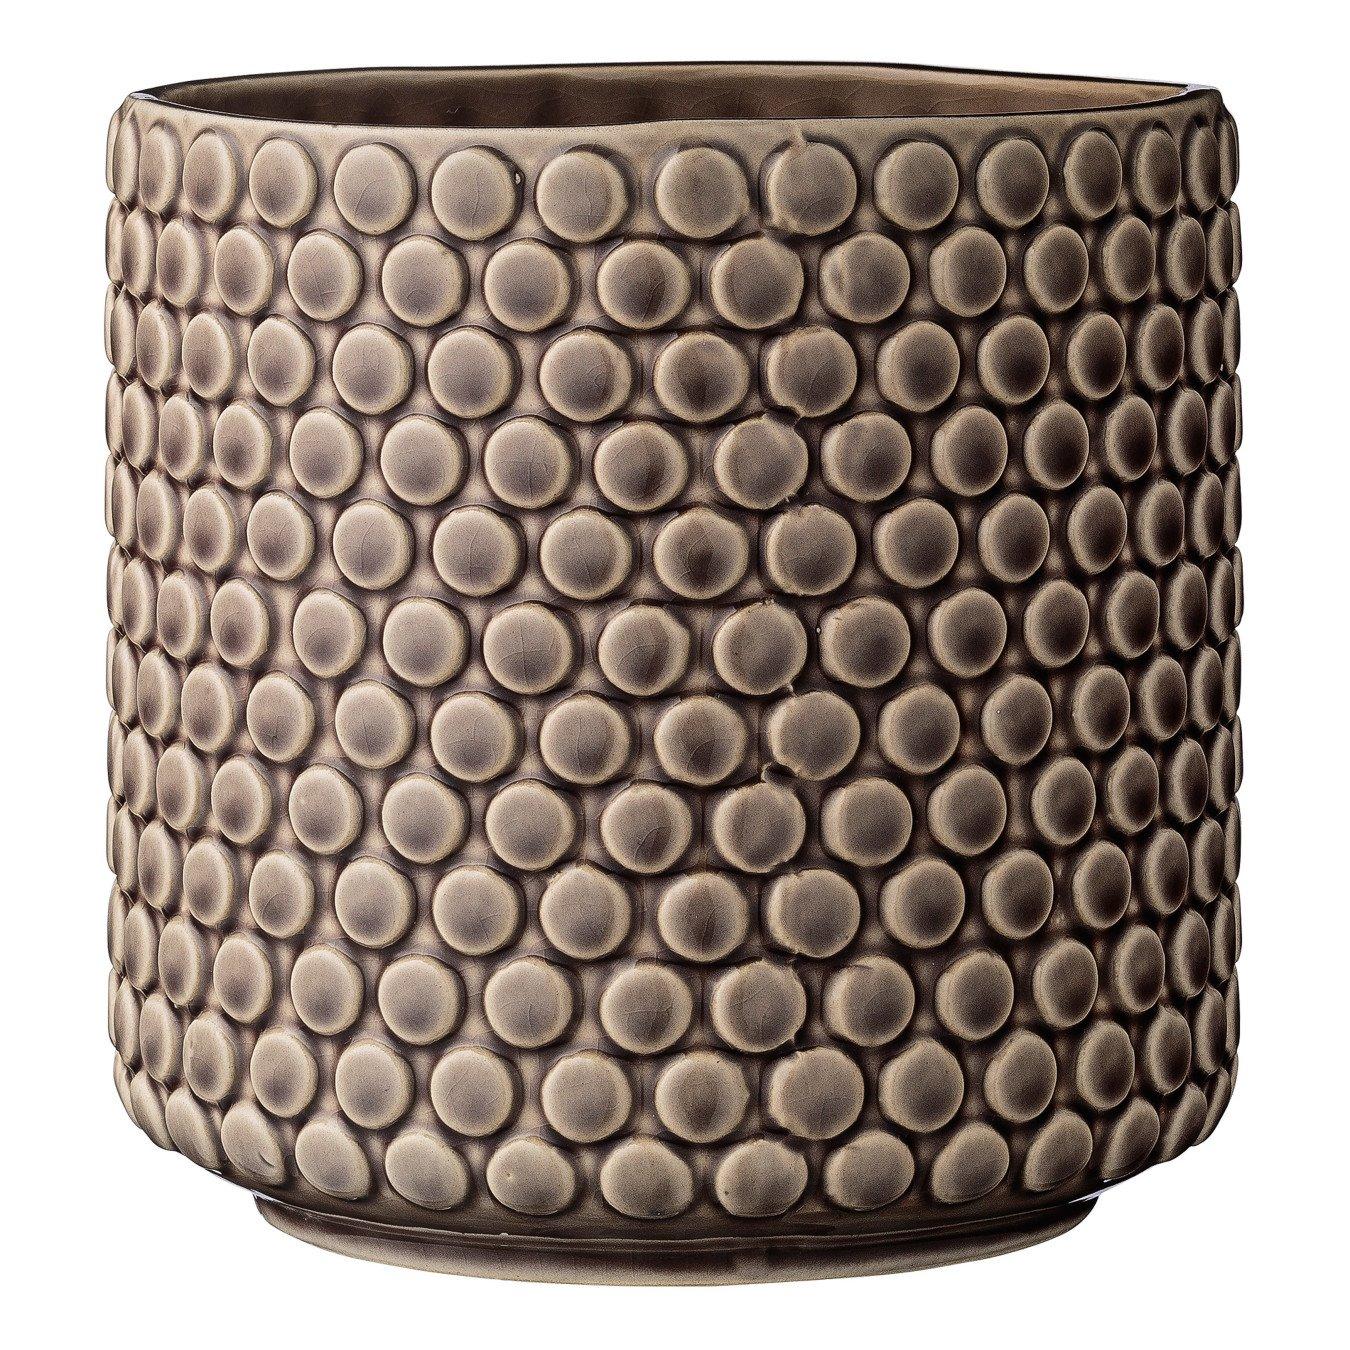 Round Brown Polka Dot Stoneware Flower Pot